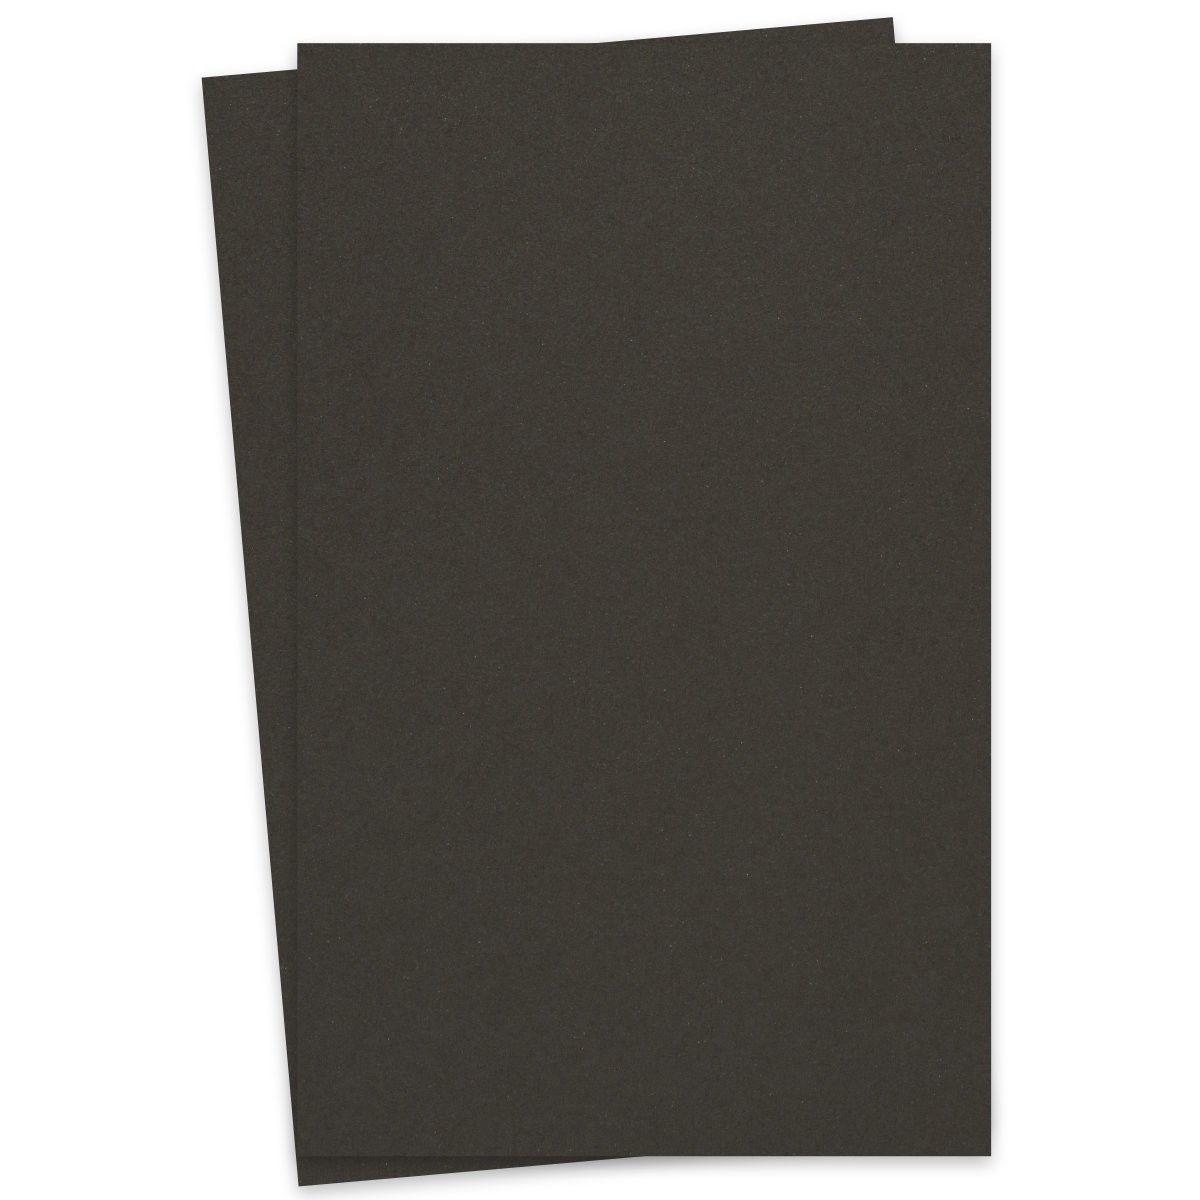 Curious Metallic Night 11 X 17 Ledger Size Cardstock Paper 300 Gsm 111lb Cover 100 Pk Cardstock Paper Metallic Paper Paper